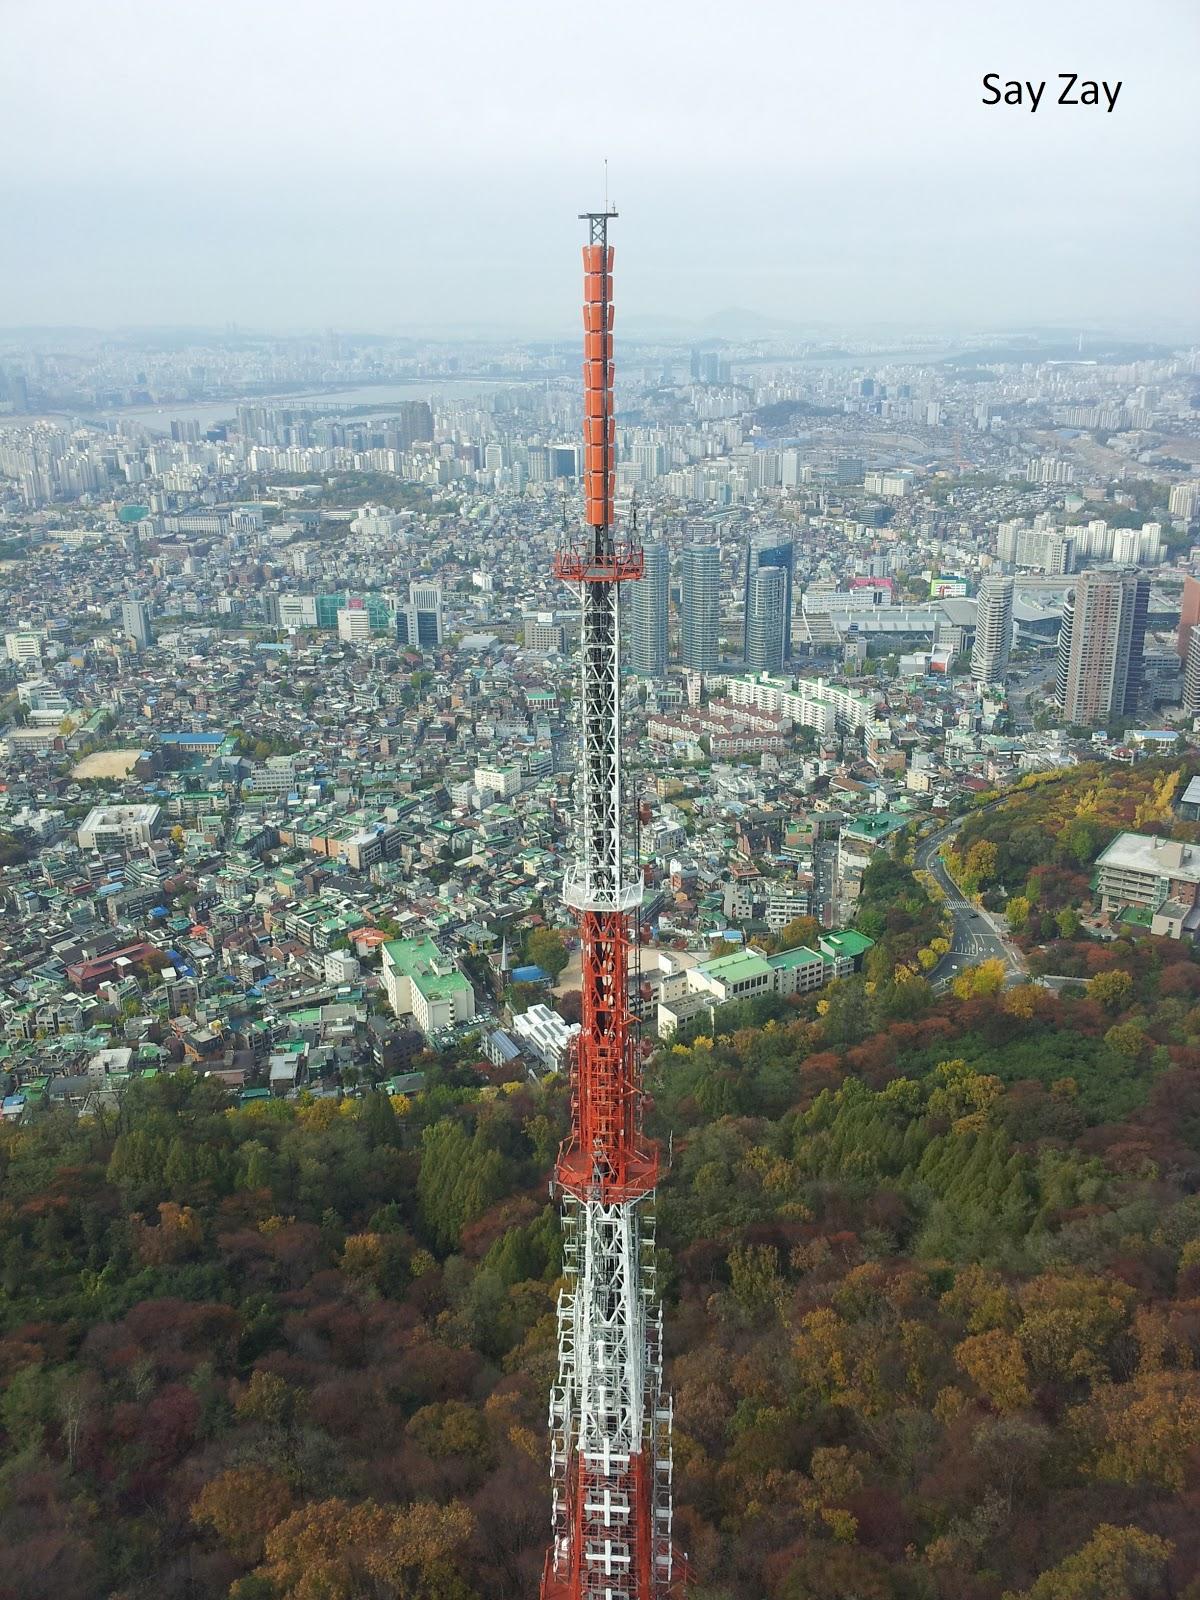 Say Zay A Guide To South Korea